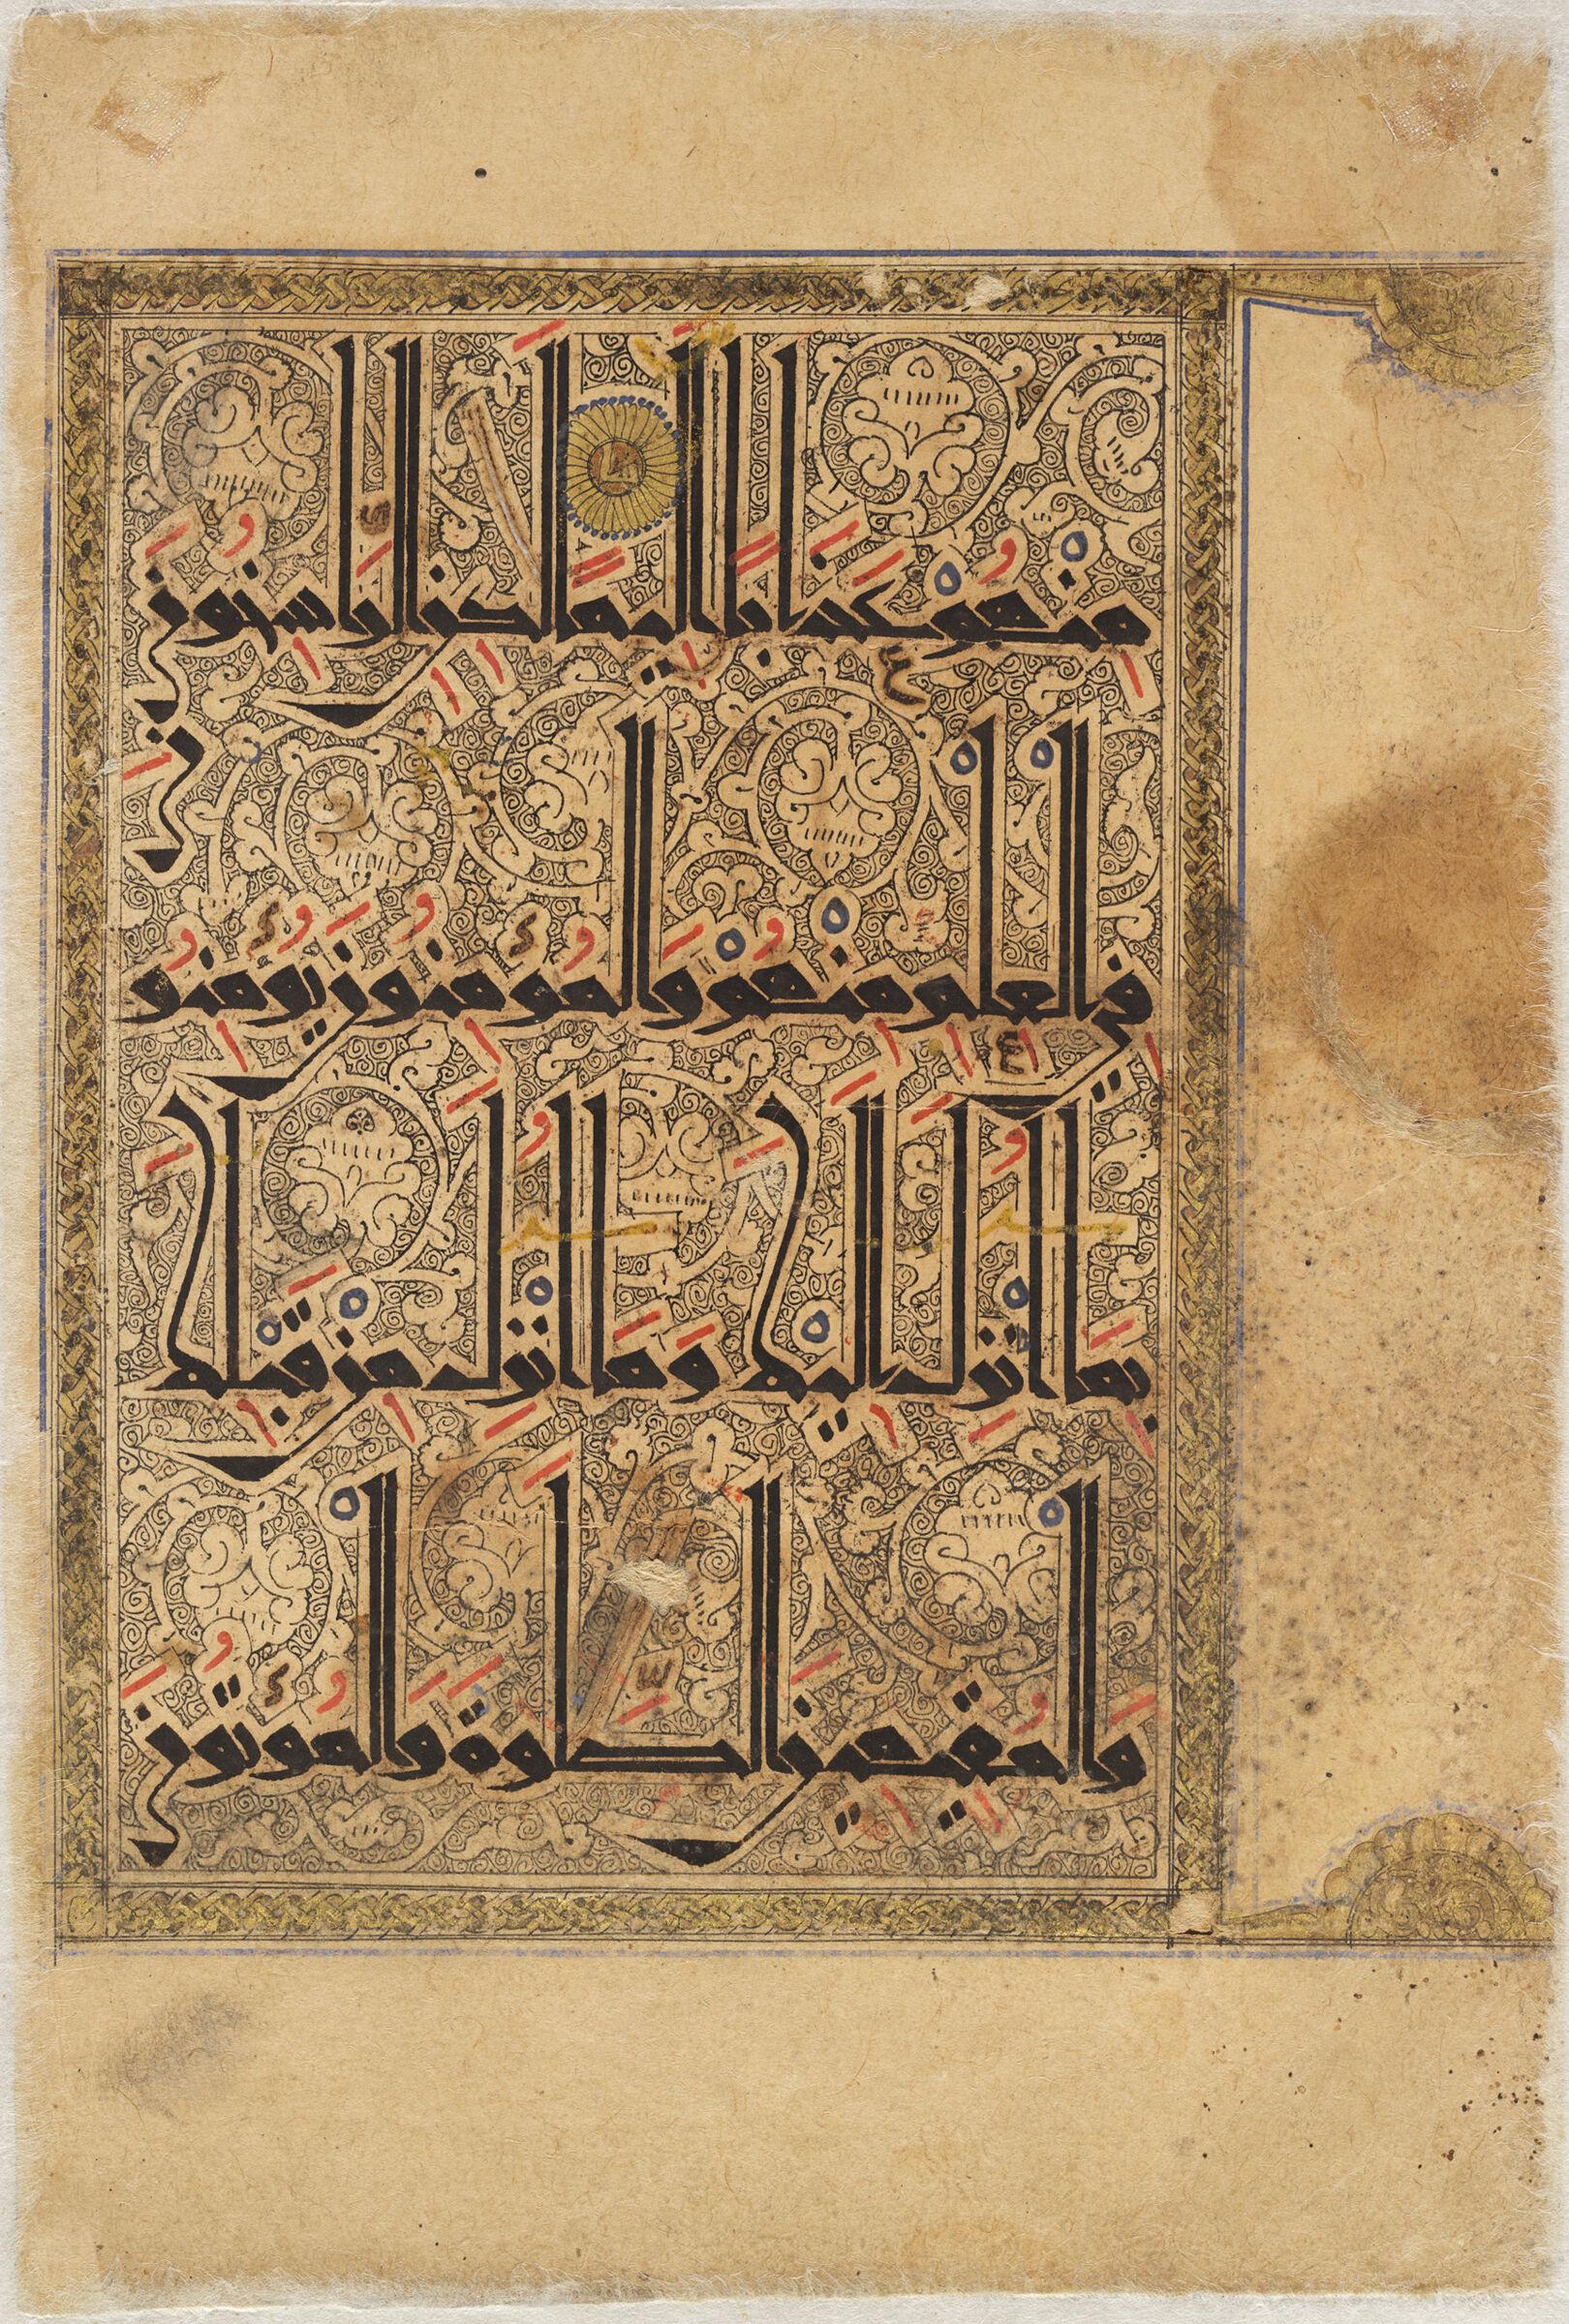 Folio From A Qur'an: Sura 4: 160 -161 (Recto), Sura 4: 161-162 (Verso)